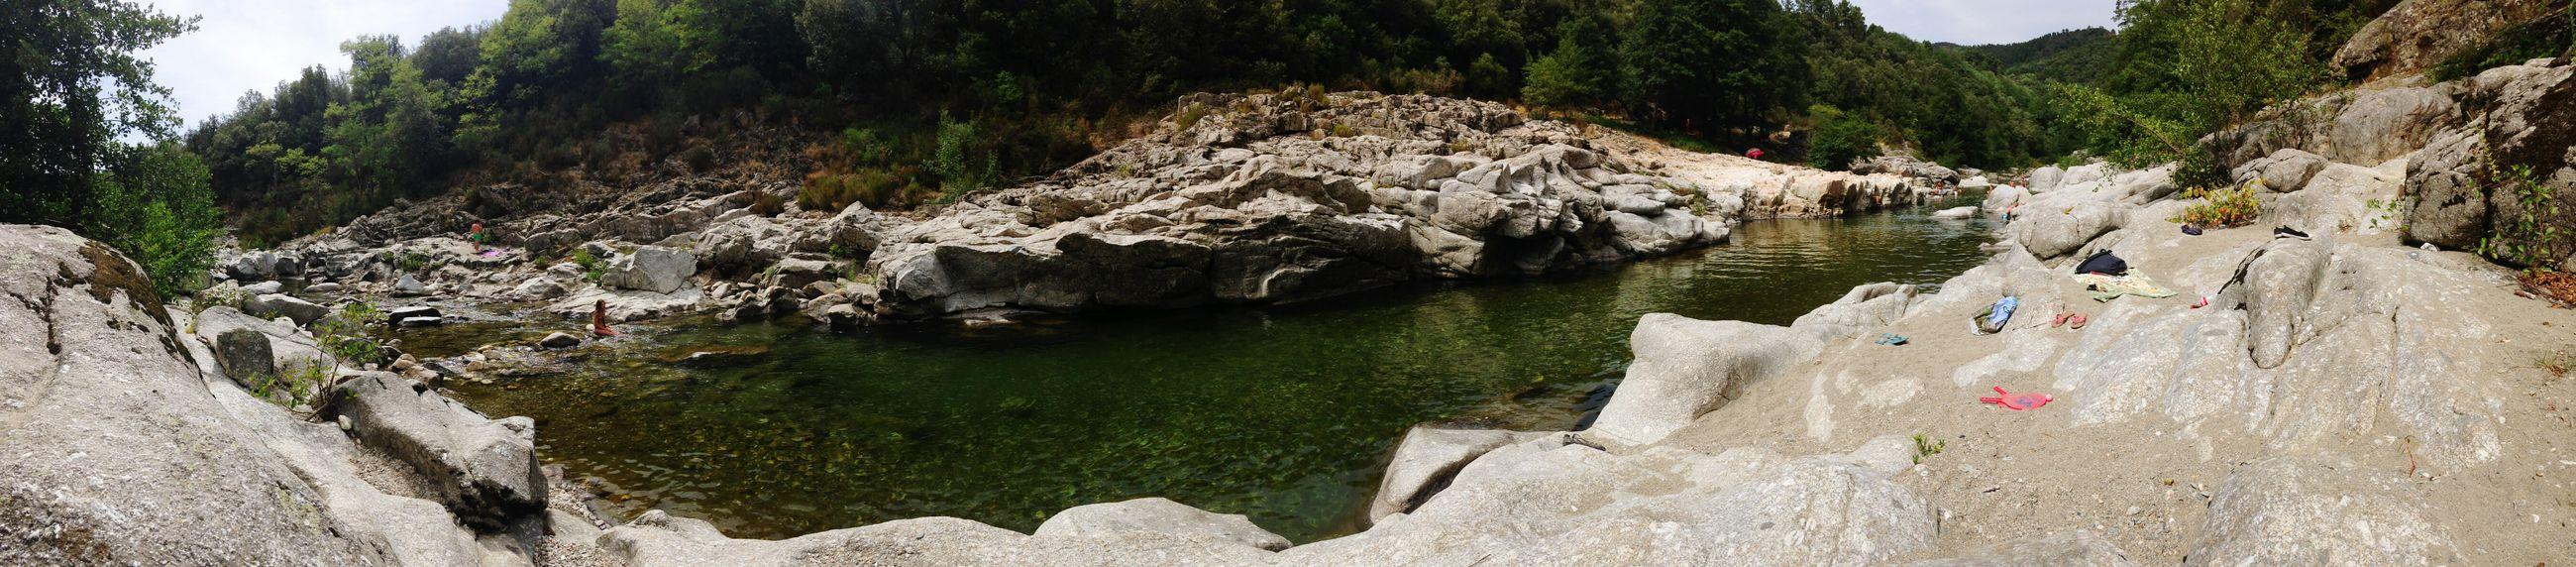 Riviere Nature Anduze Eau